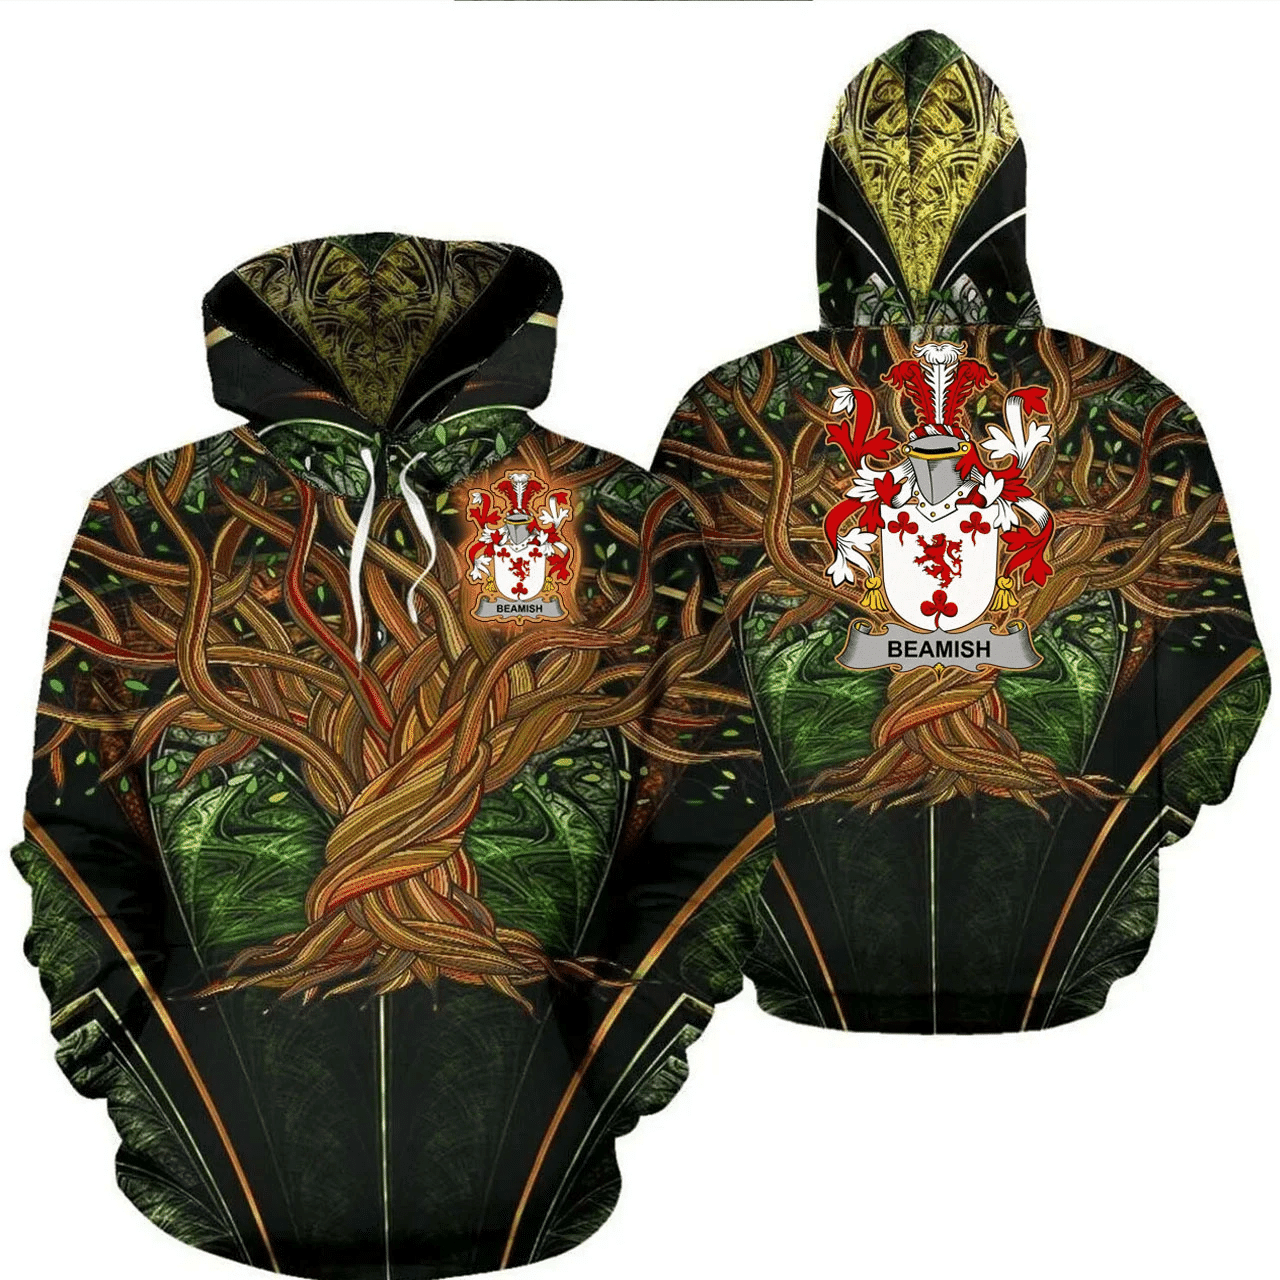 1stIreland Ireland Hoodie - Beamish Irish Family Crest Hoodie - Tree Of Life A7